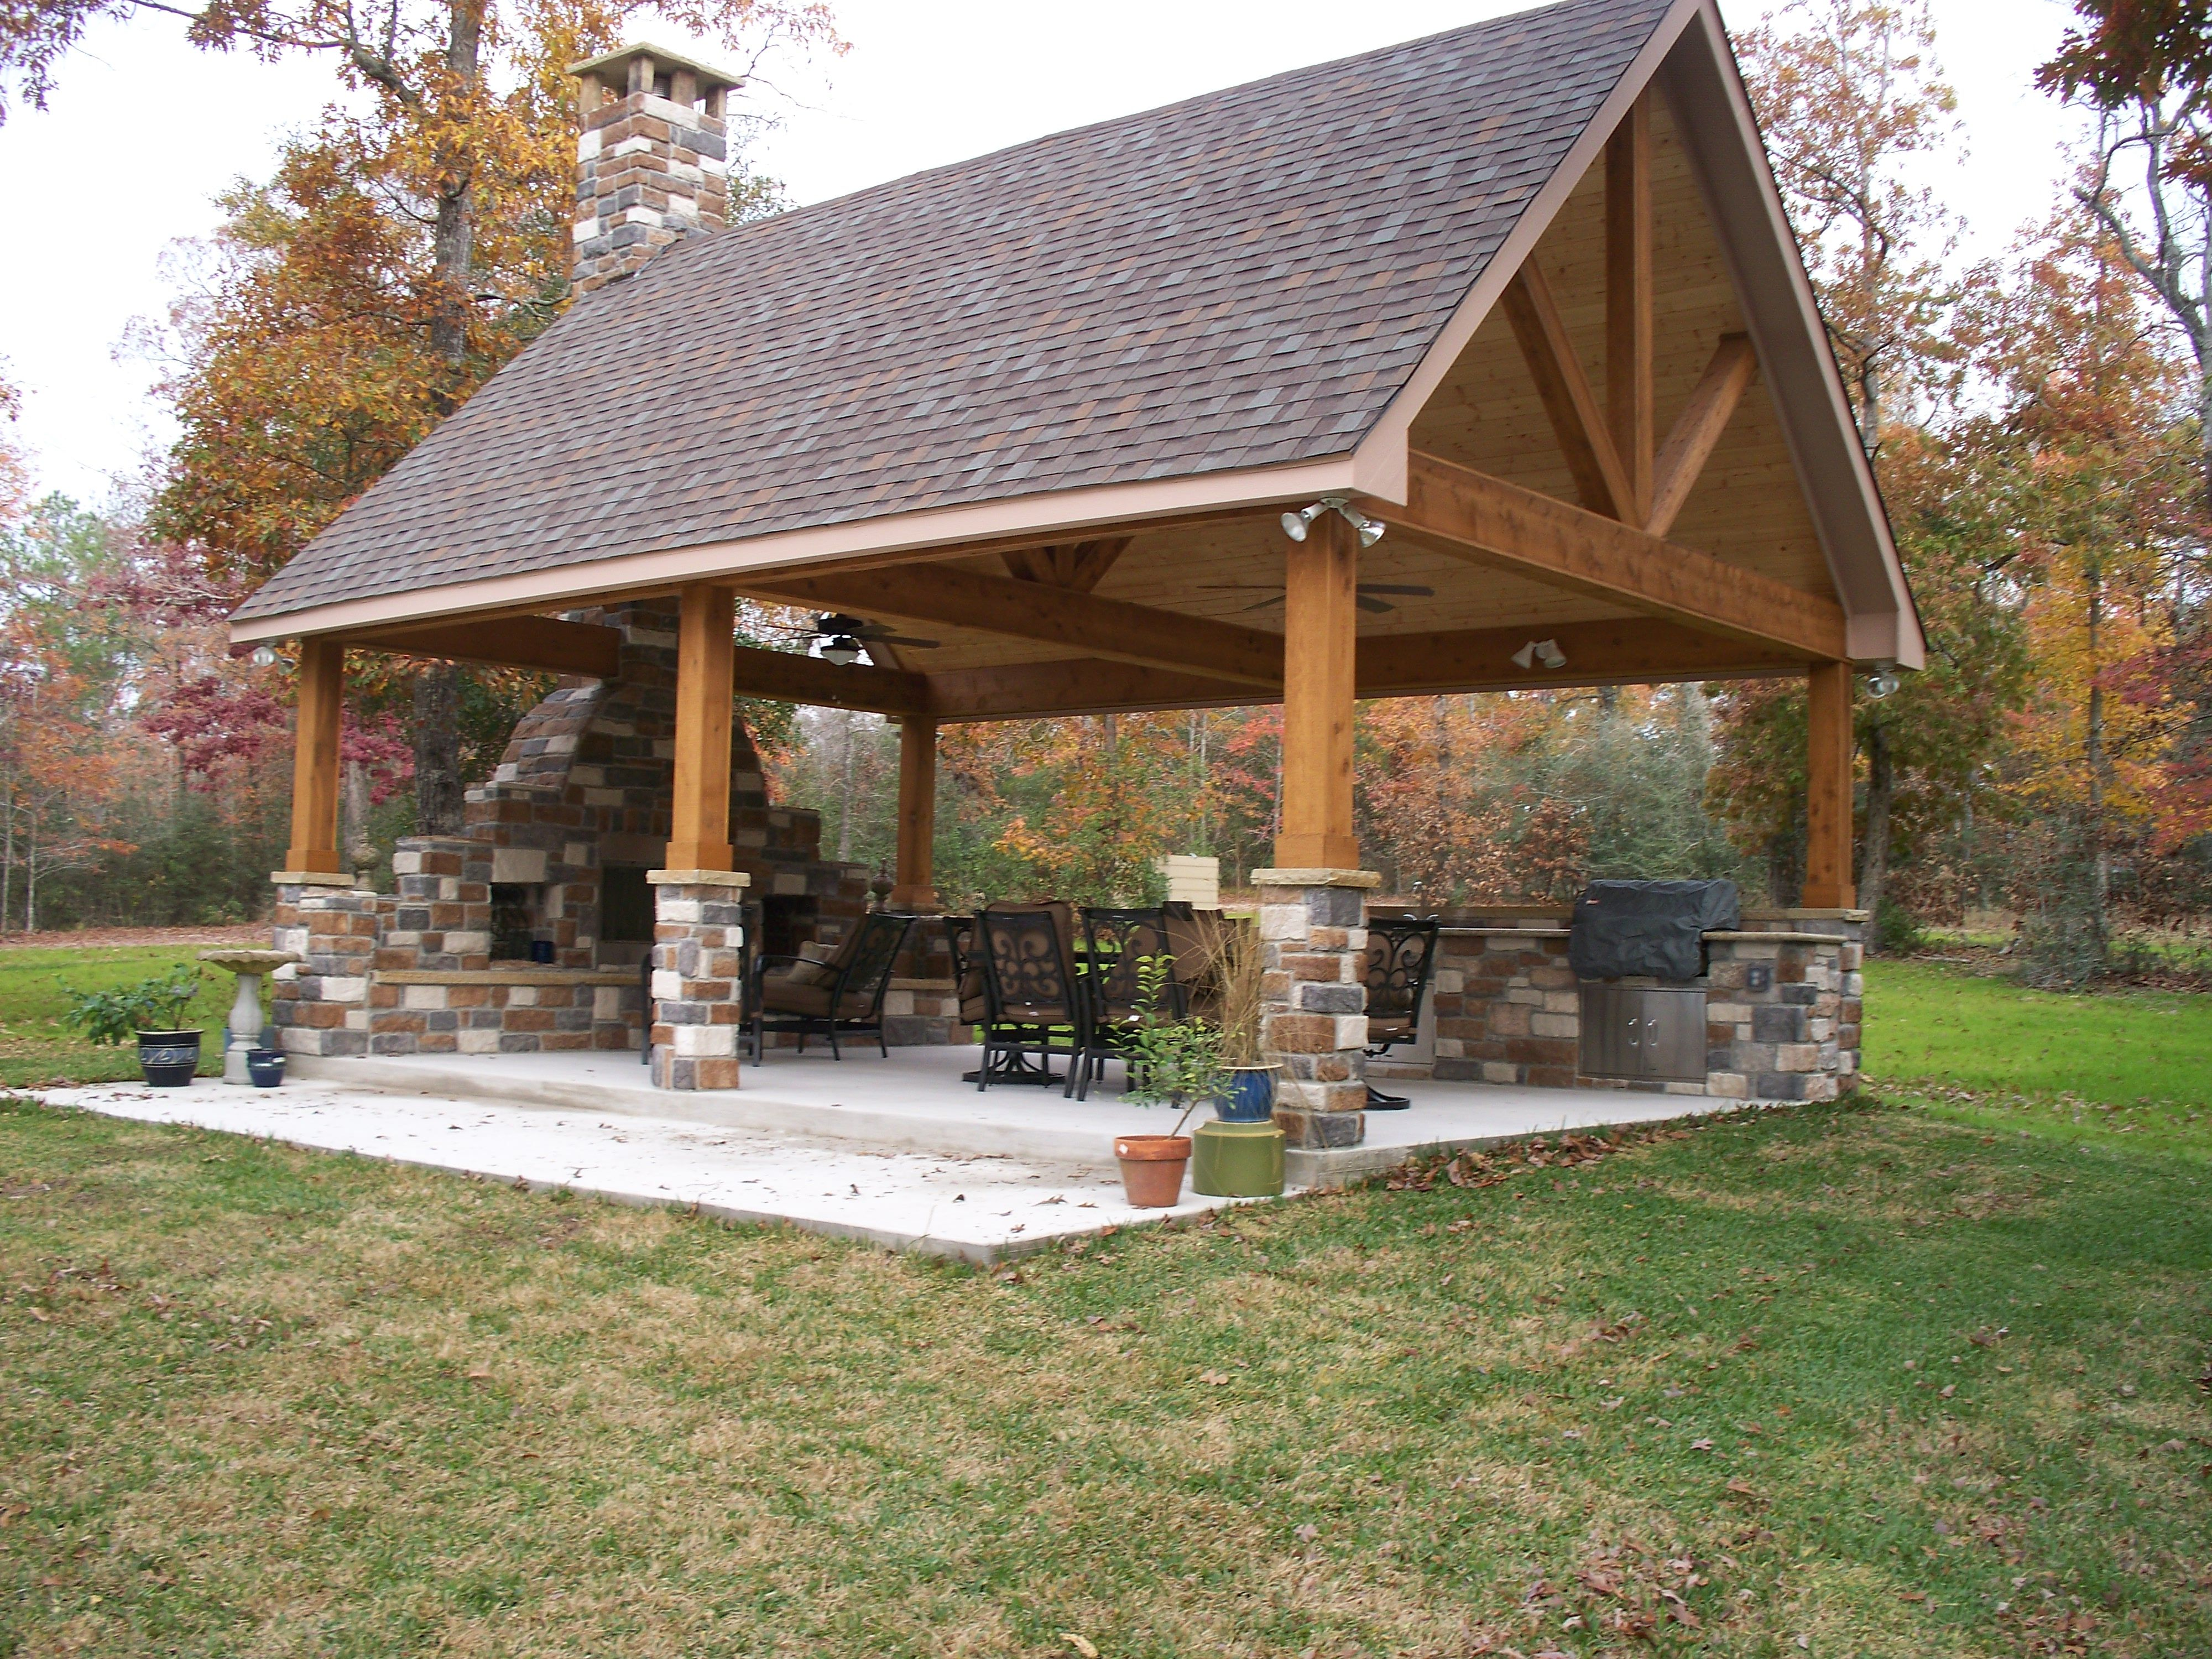 The Patio Backyard Pavilion Outdoor Pavilion Backyard